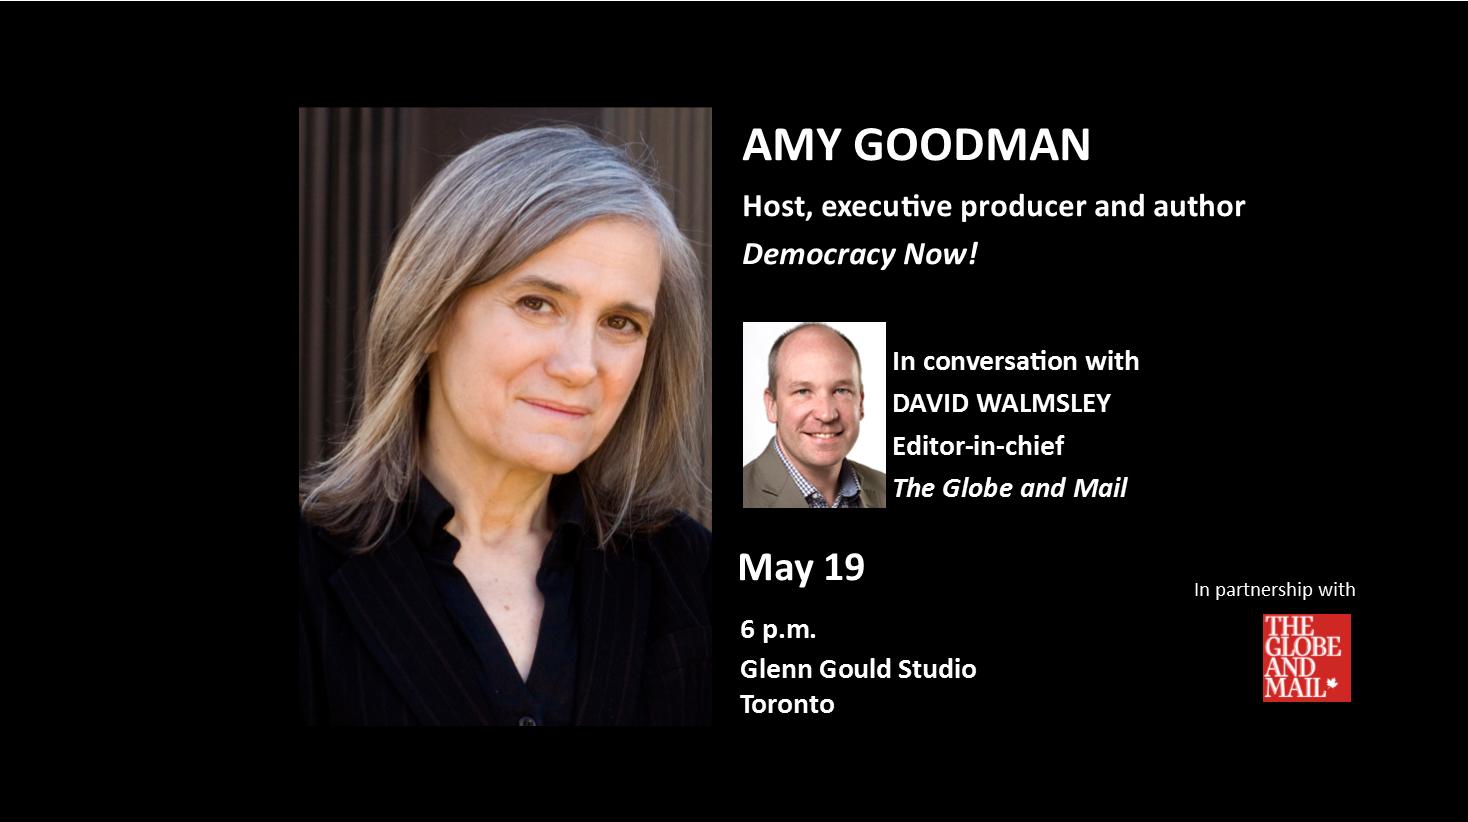 Amy Goodman with David Walmsley